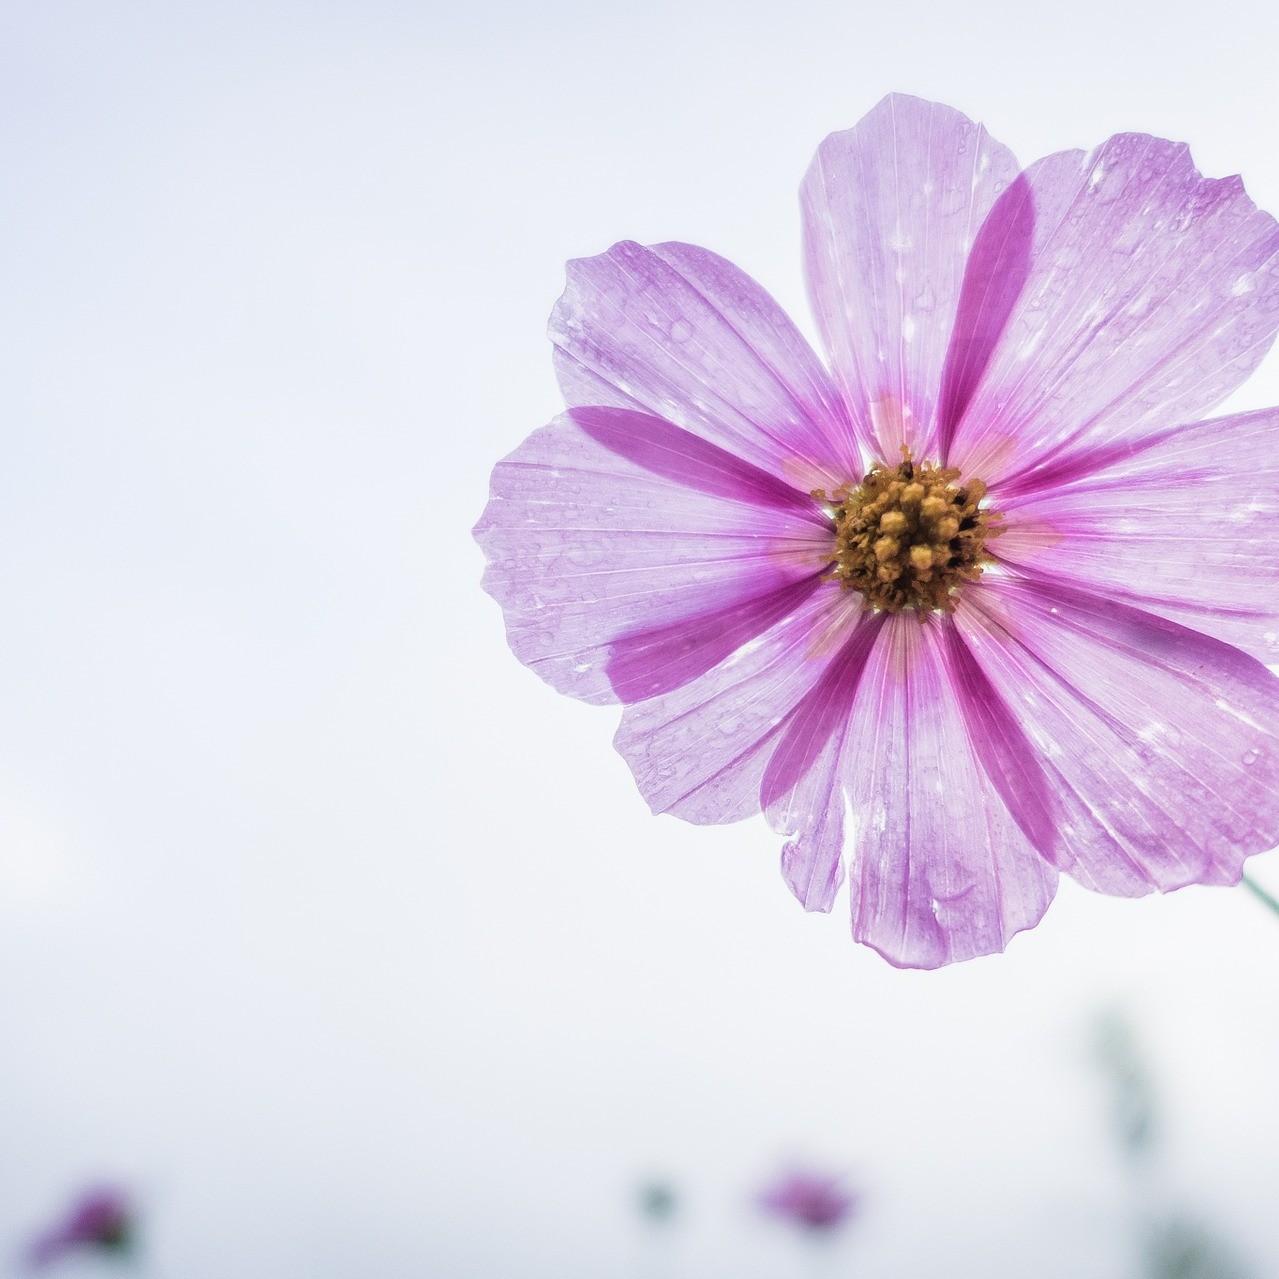 cosmos-flower-1712177_1920